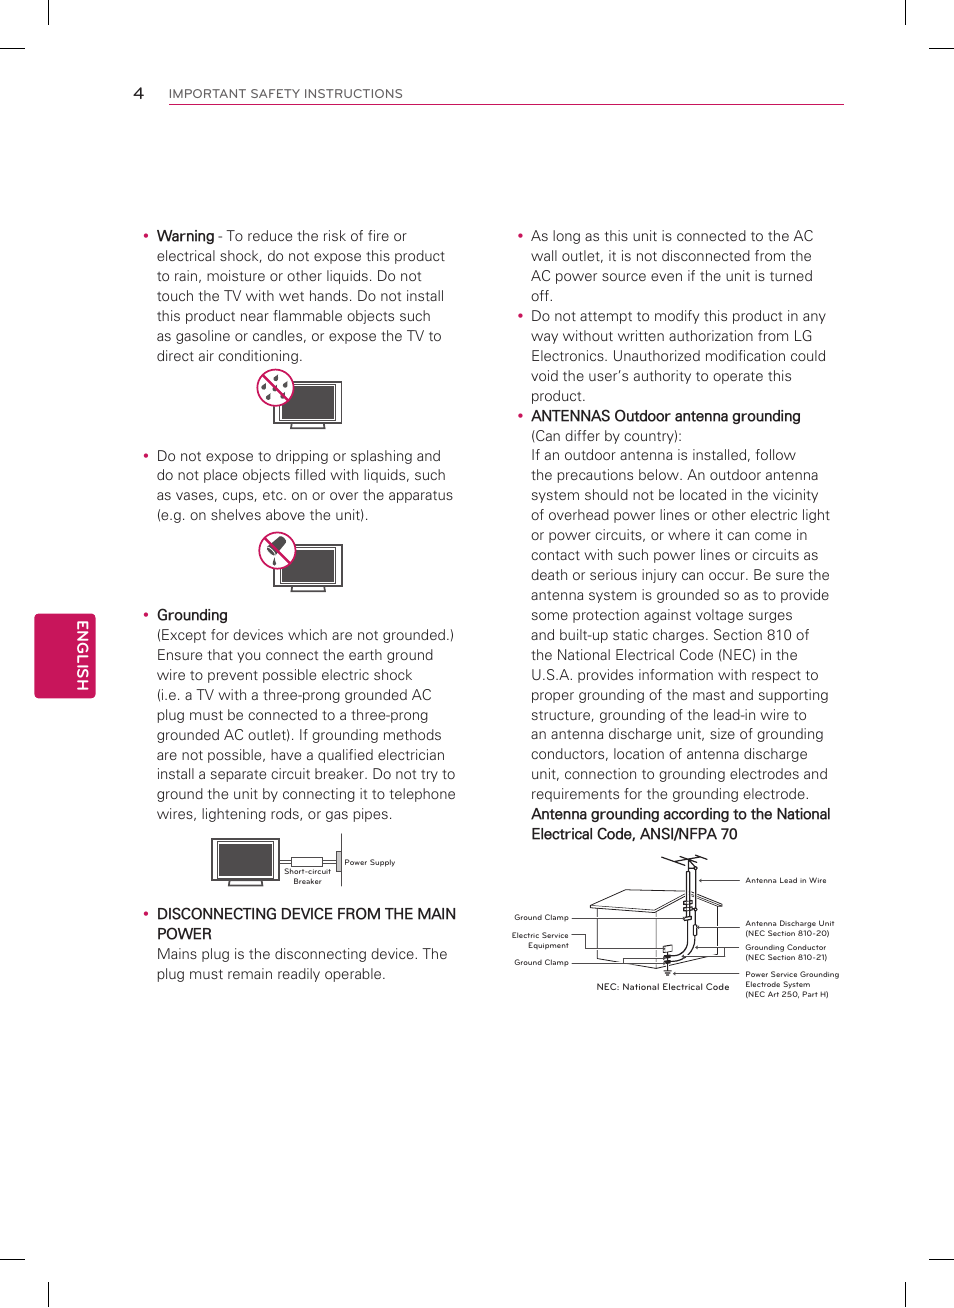 Short-circuit breaker power supply, English | LG 32LS3500 Manuel d